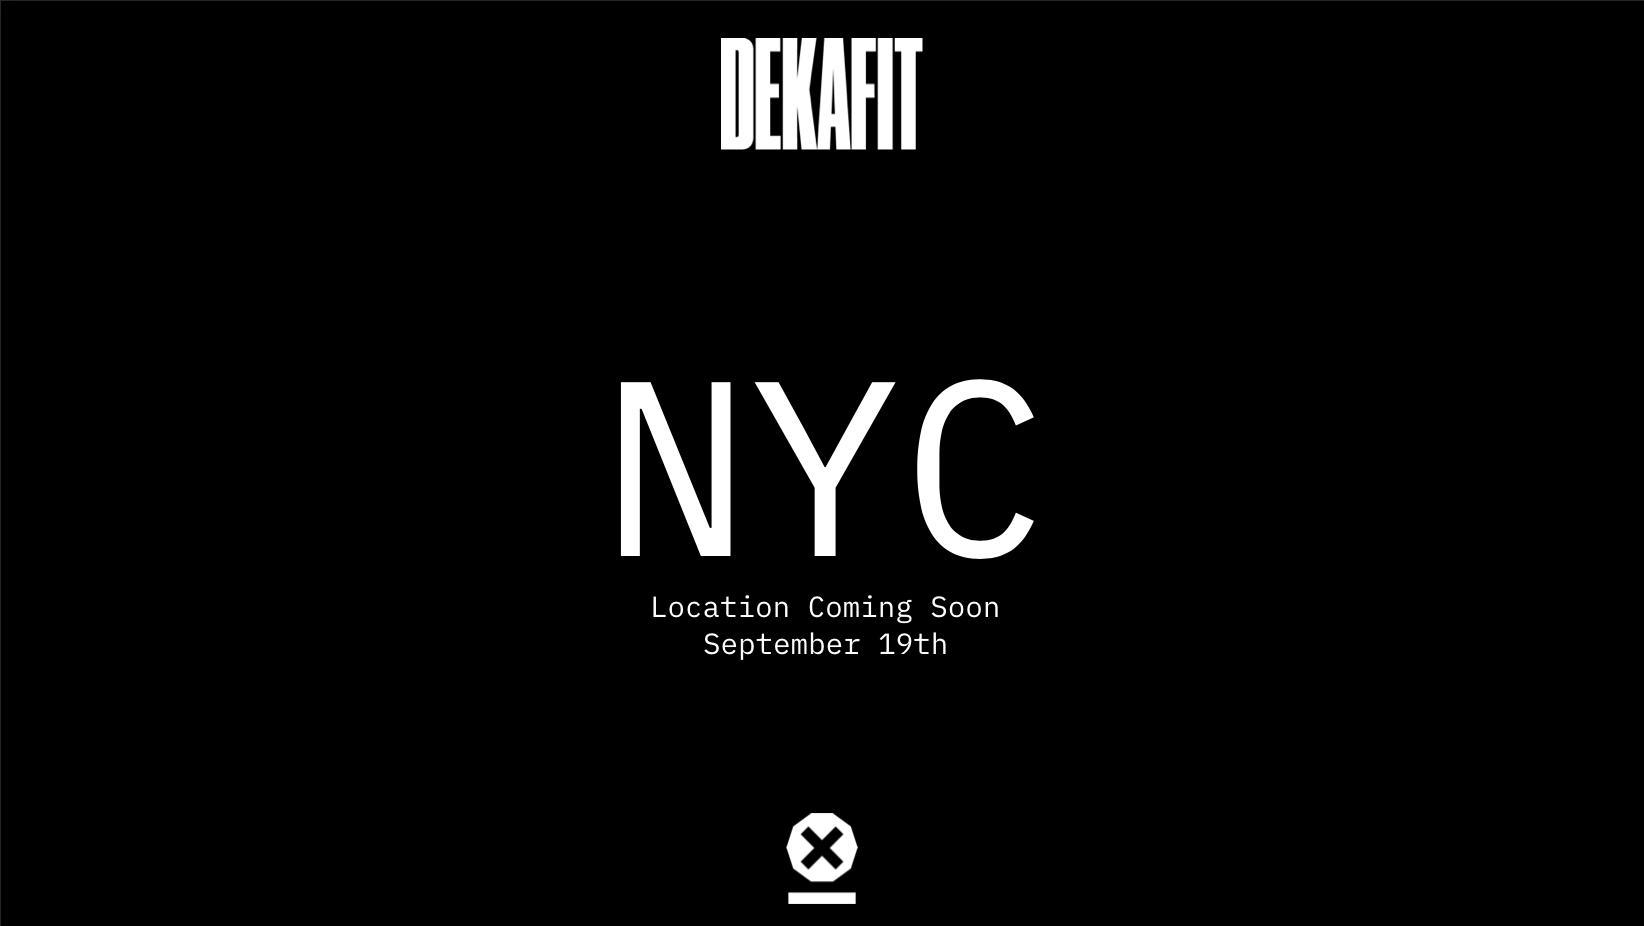 DEKAFIT New York City - PRE REGISTRATION